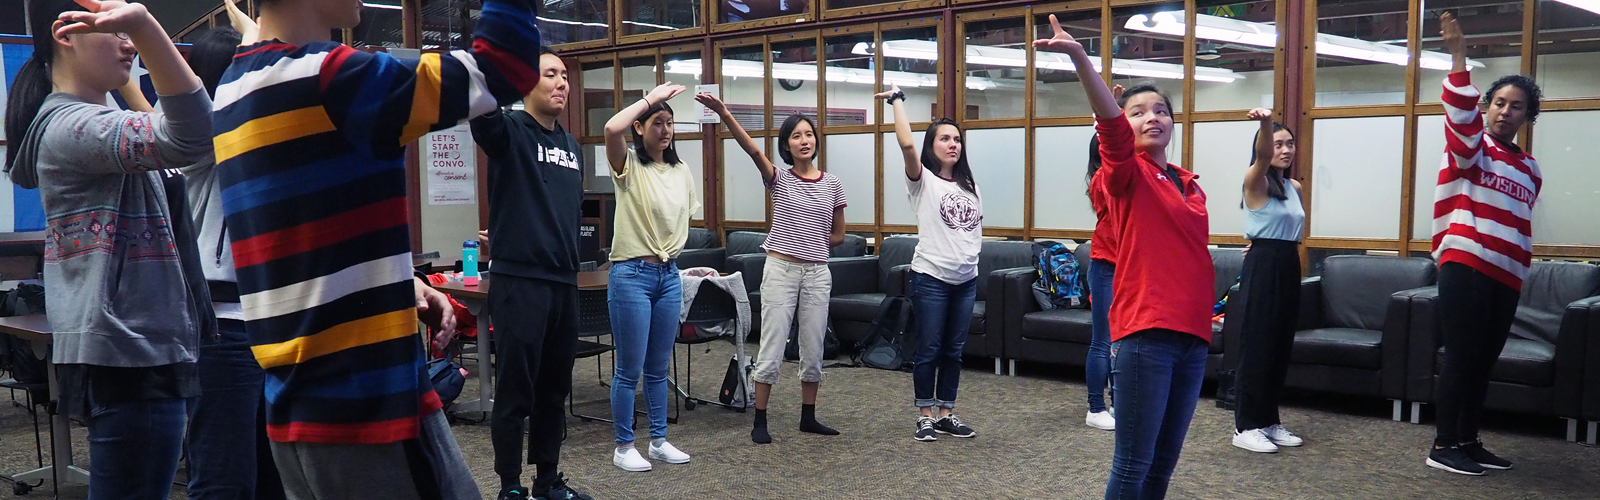 Dance lesson by LANSe Dance